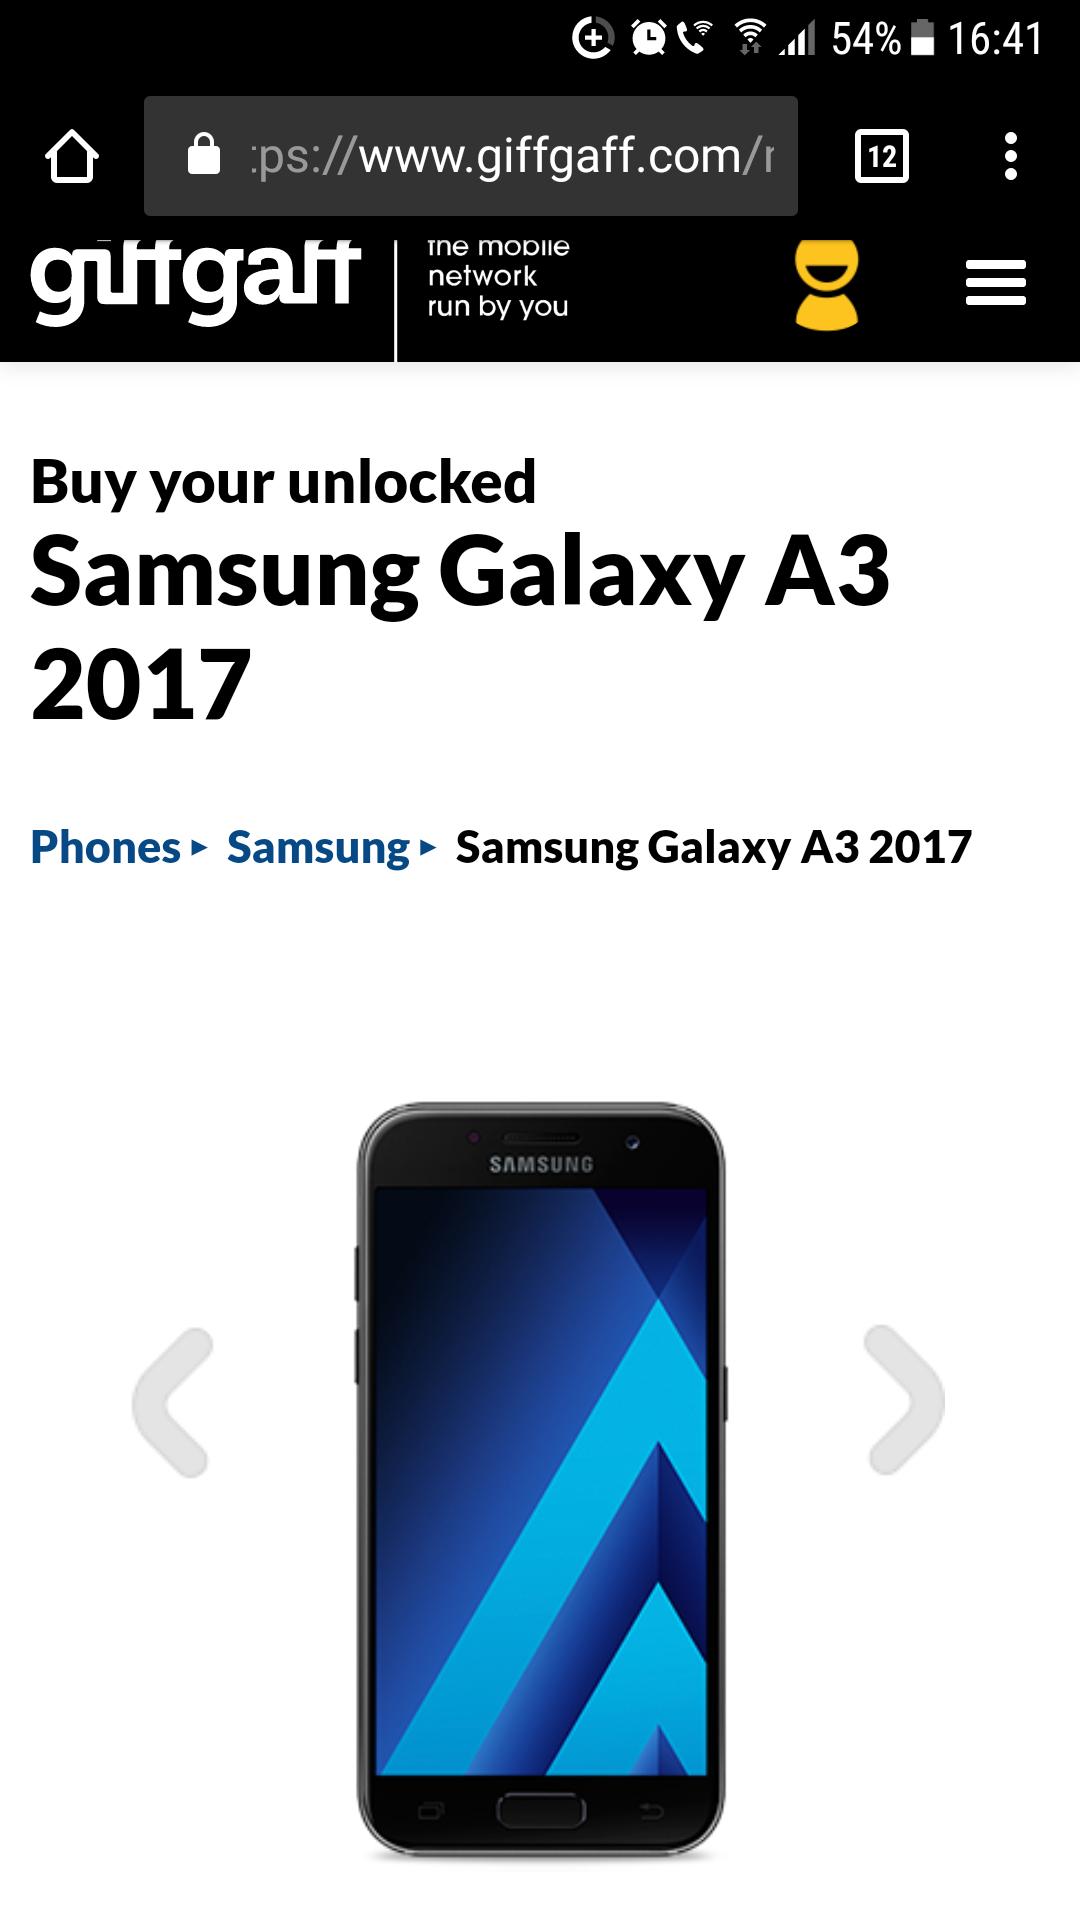 Samsung Galaxy A3 2017 from GiffGaff for £209